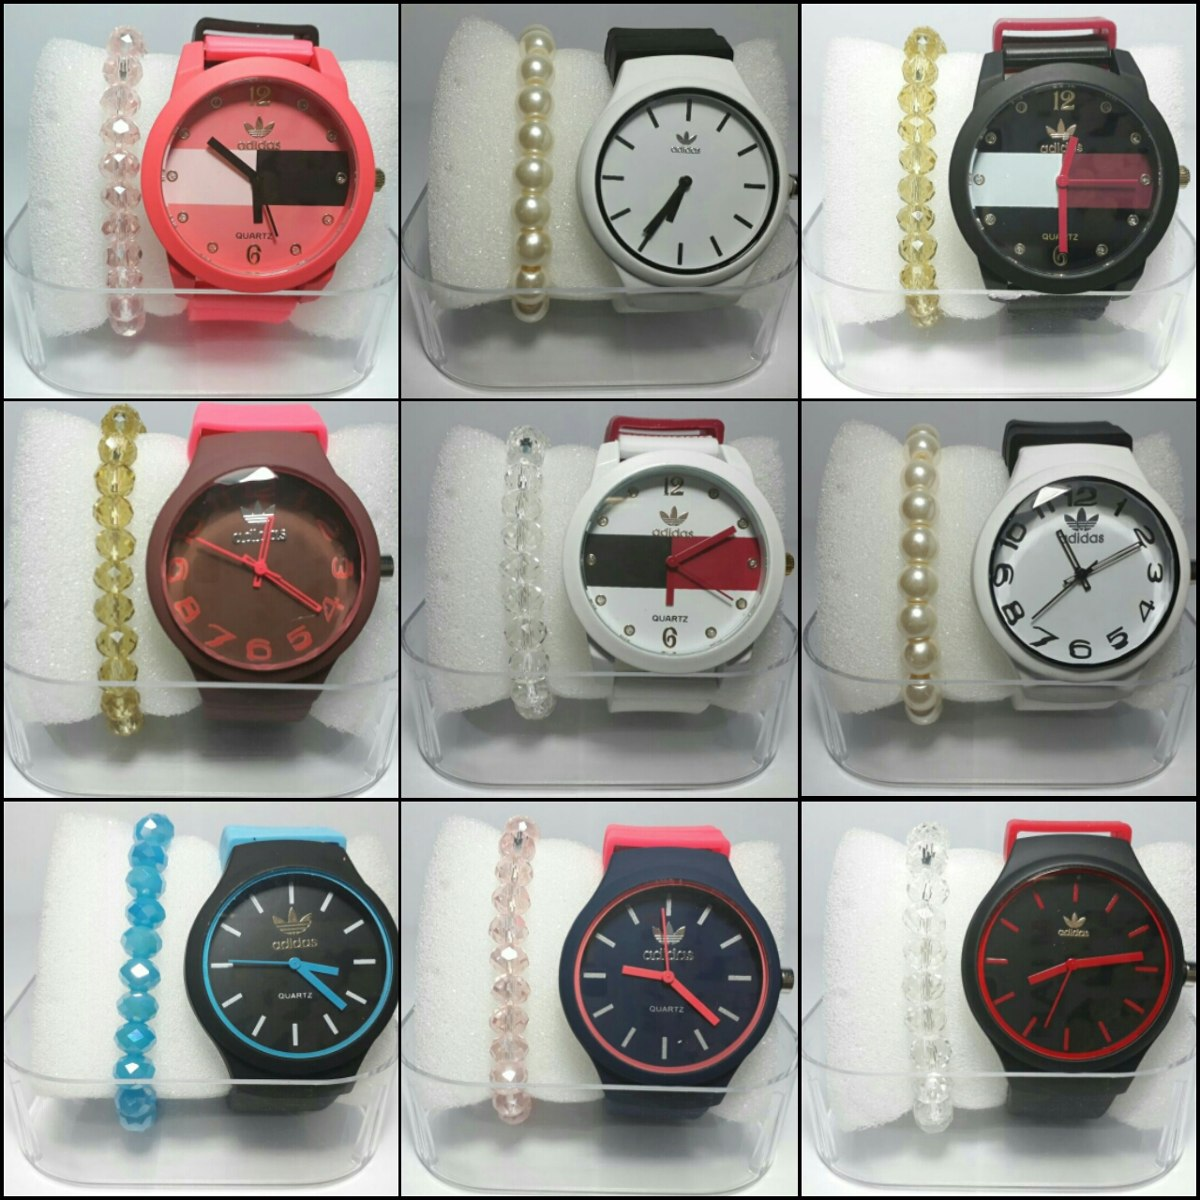 bf08cccbd11 Relógio adidas Feminino 10 Relógios 10 Caixas 10 Pulseira - R  189 ...